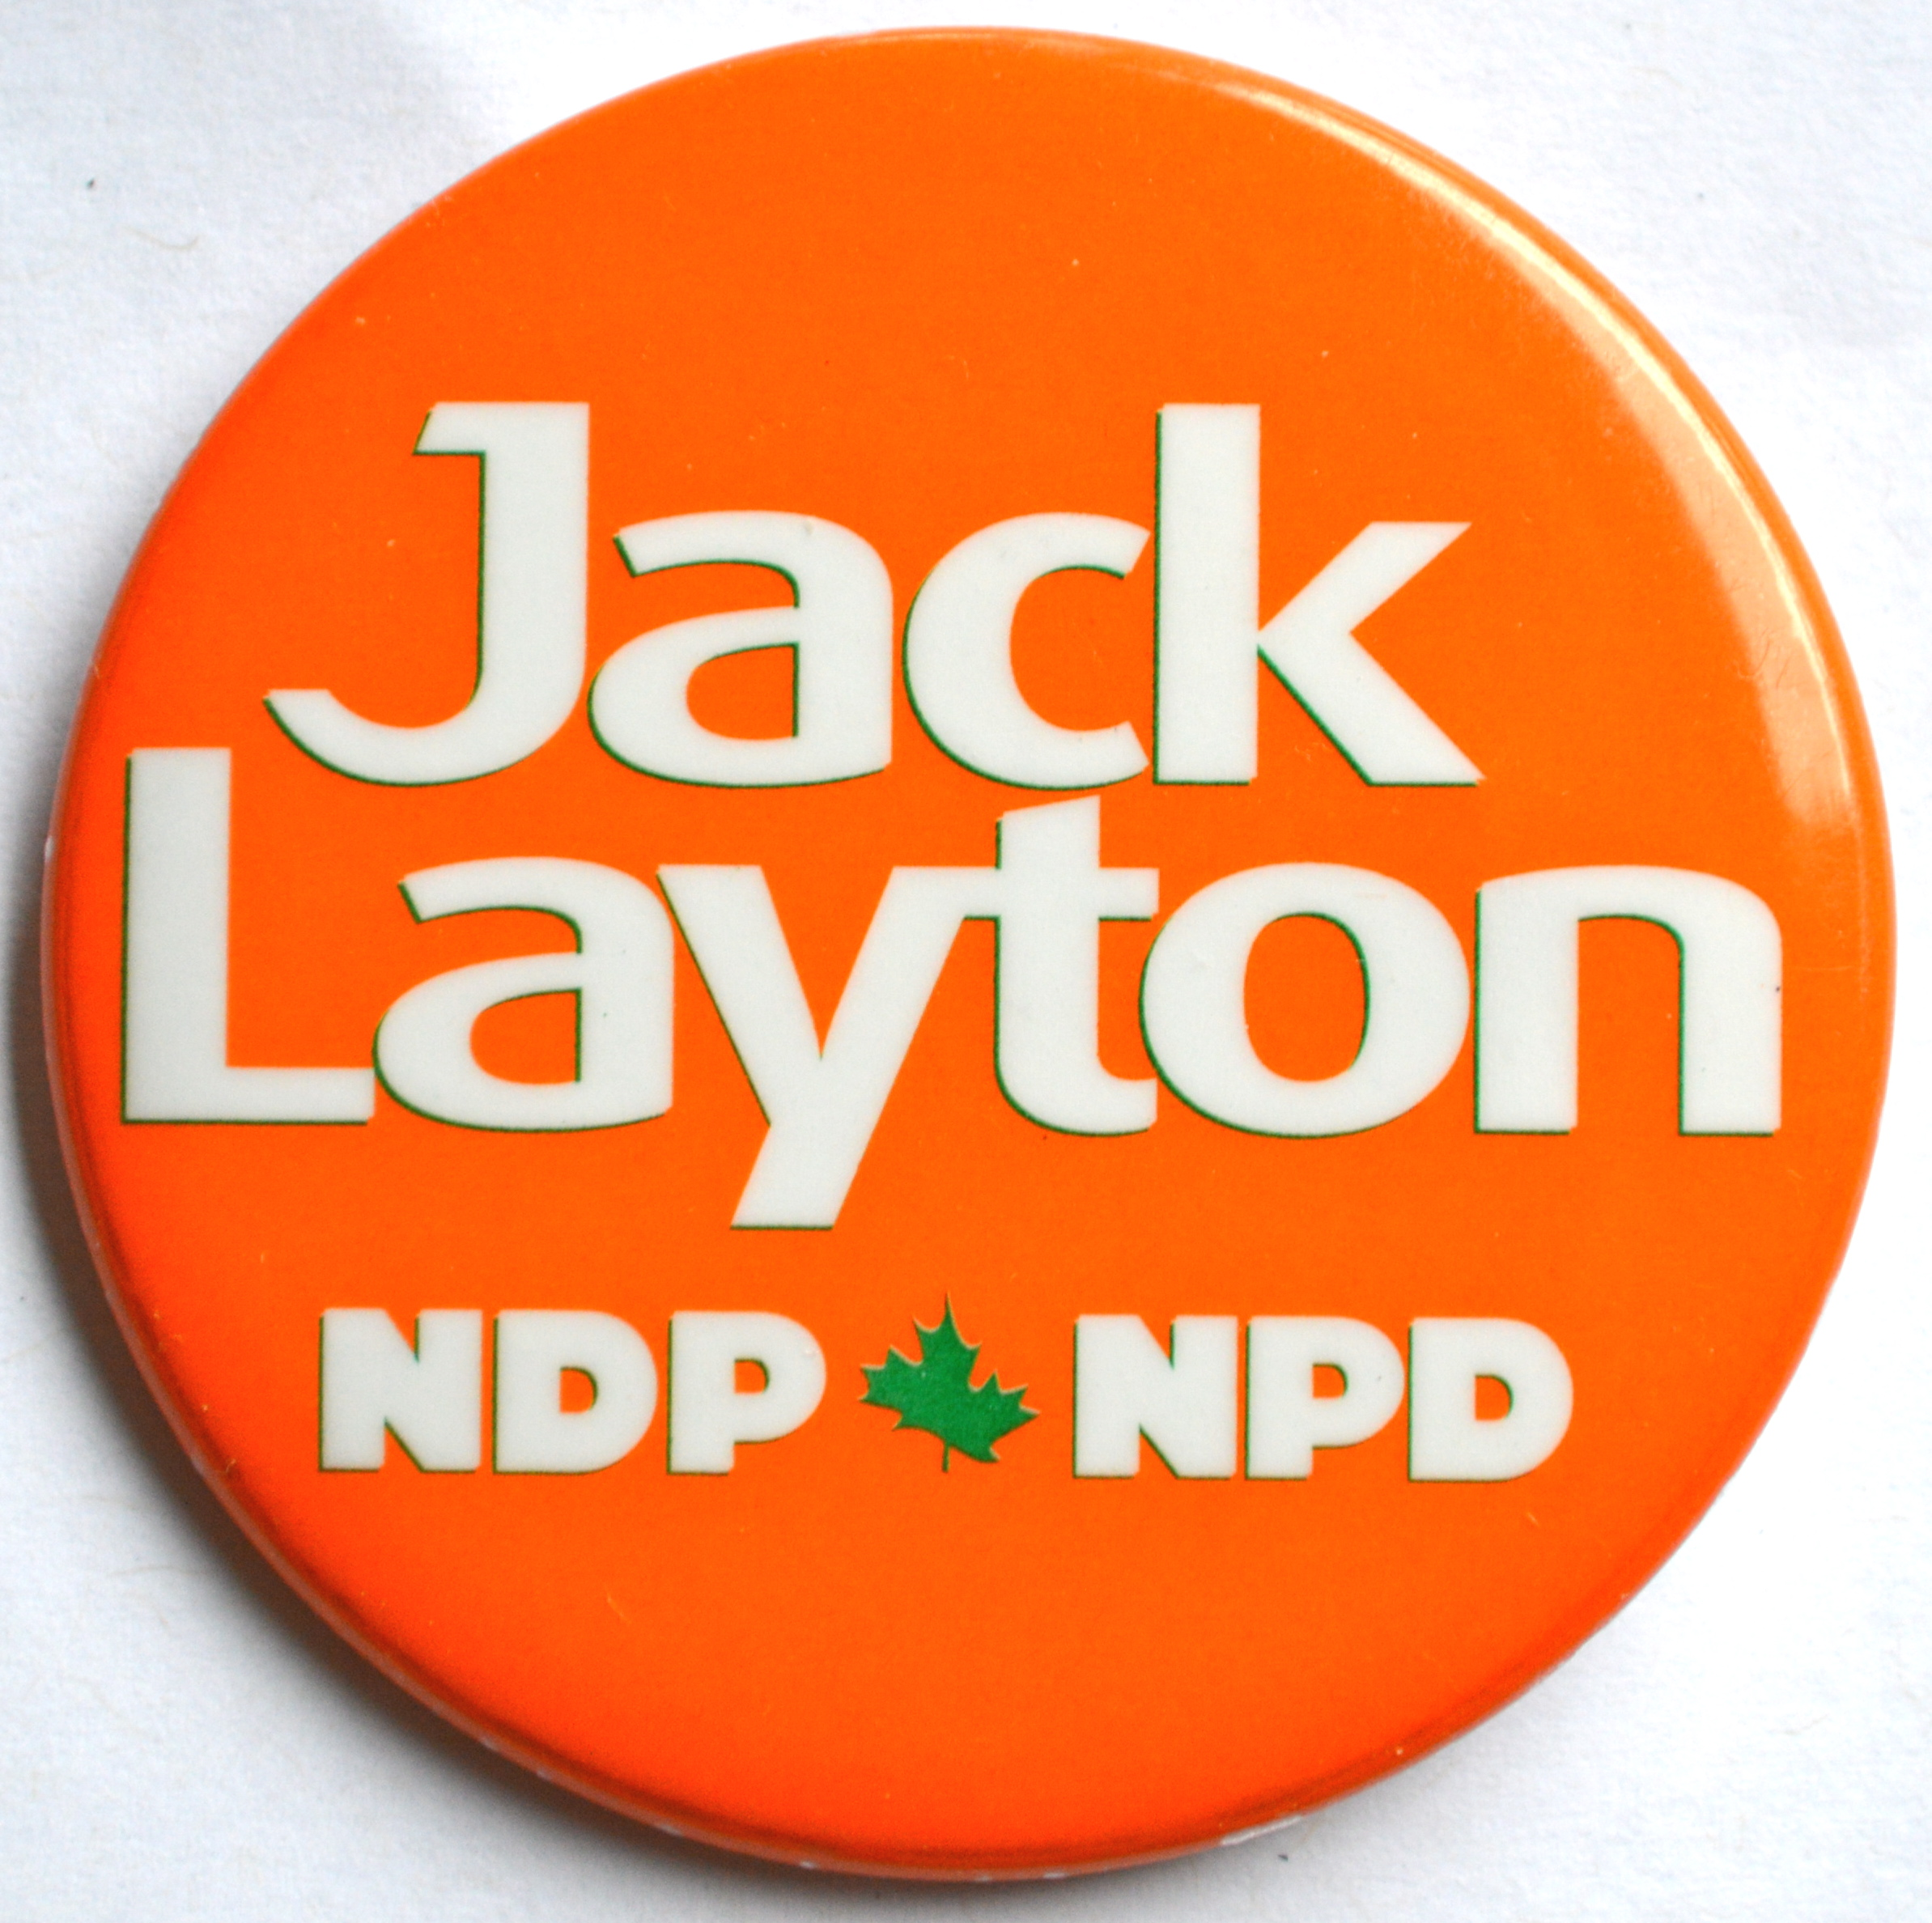 Jack Layton Button